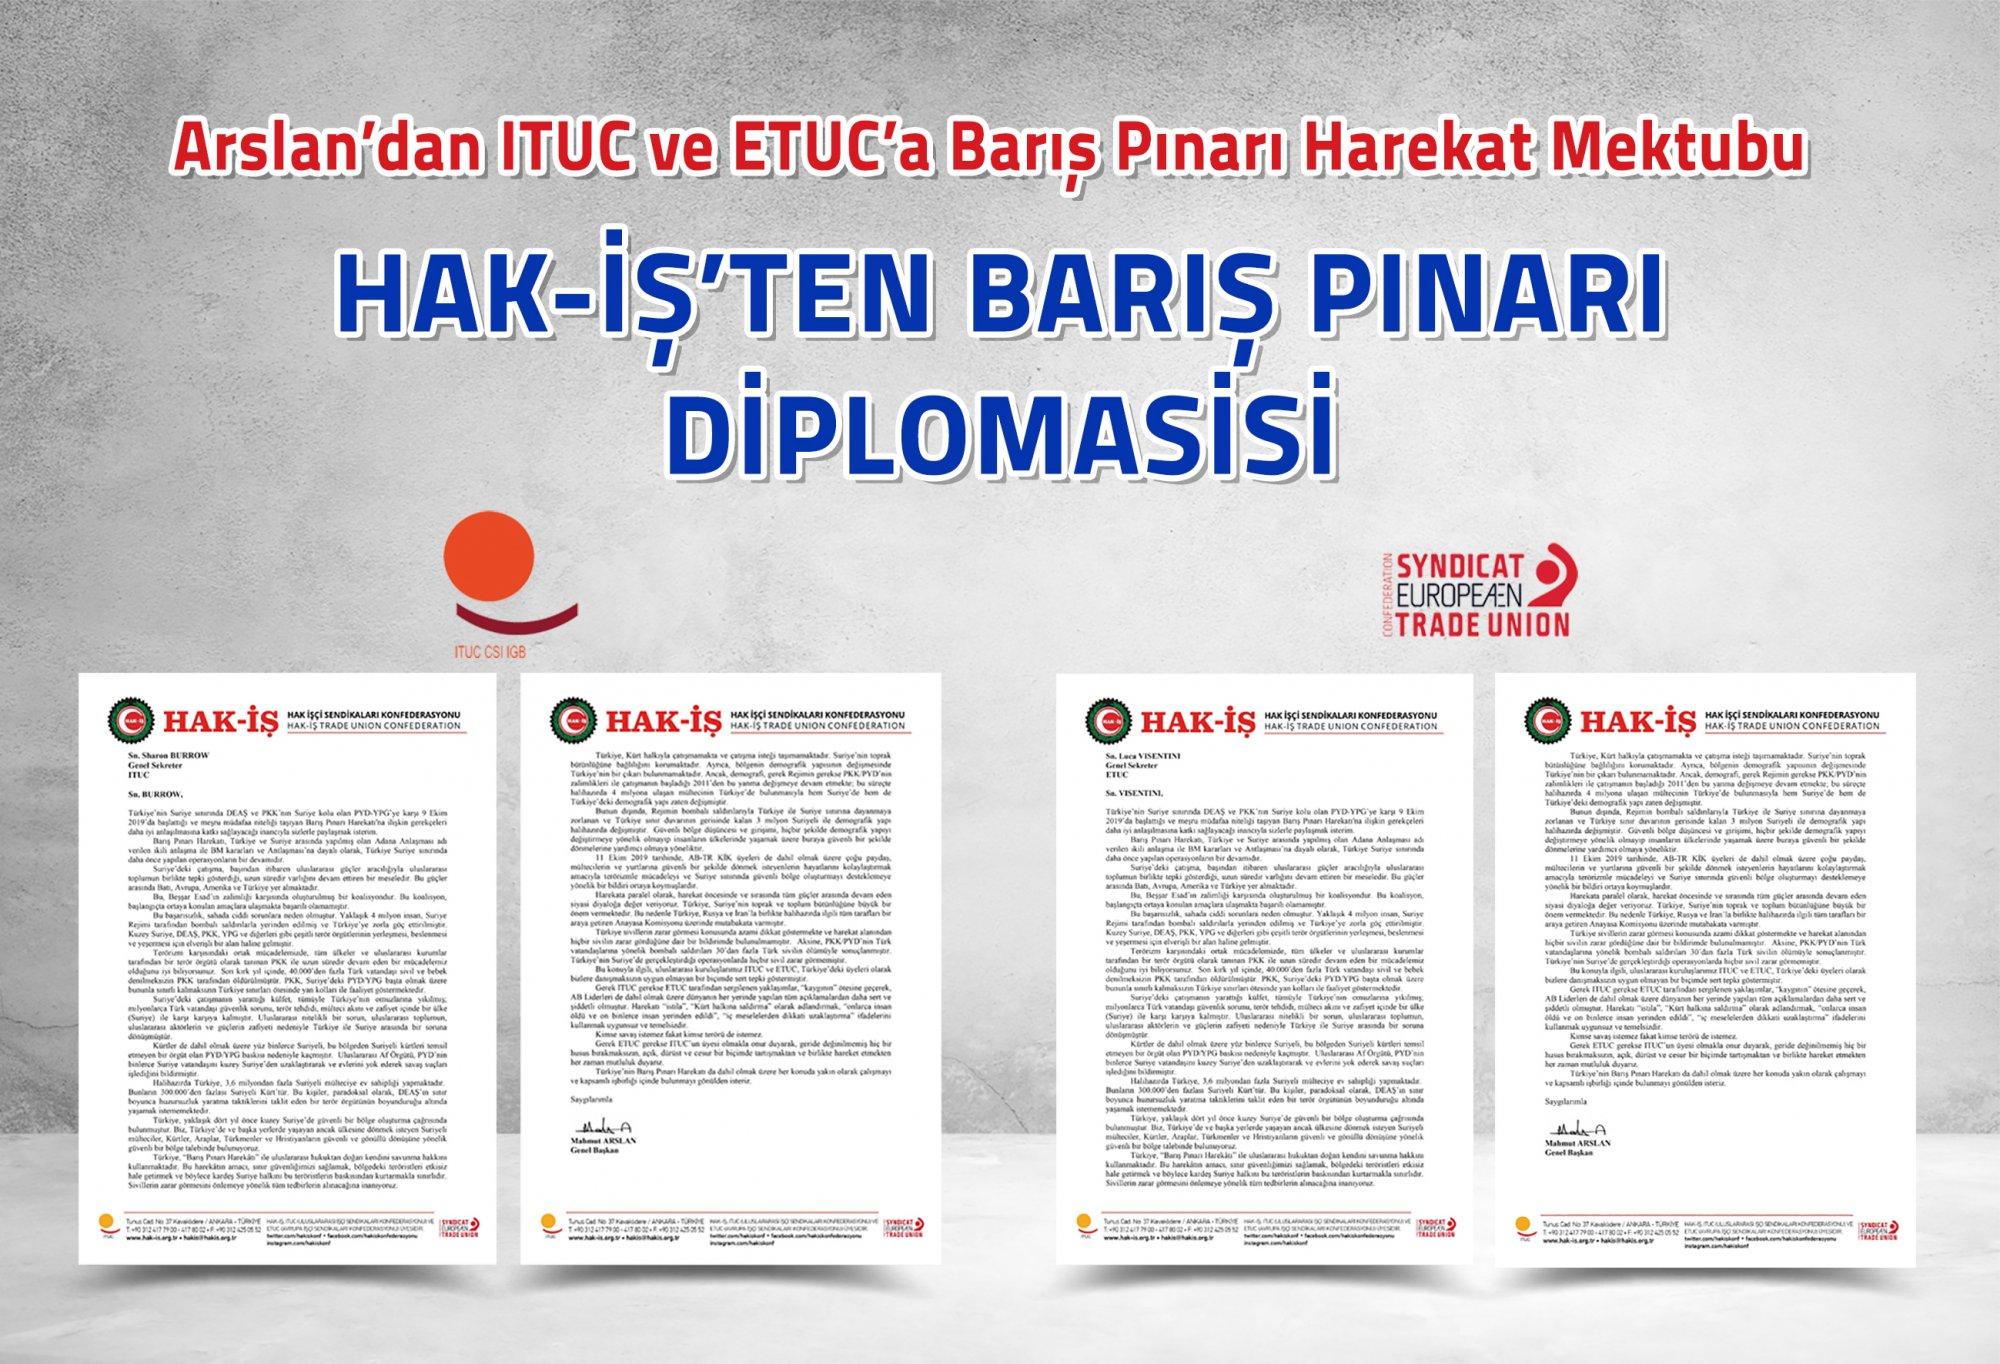 ARSLAN'DAN ITUC VE ETUC'A BARIŞ PINARI HAREKAT MEKTUBU